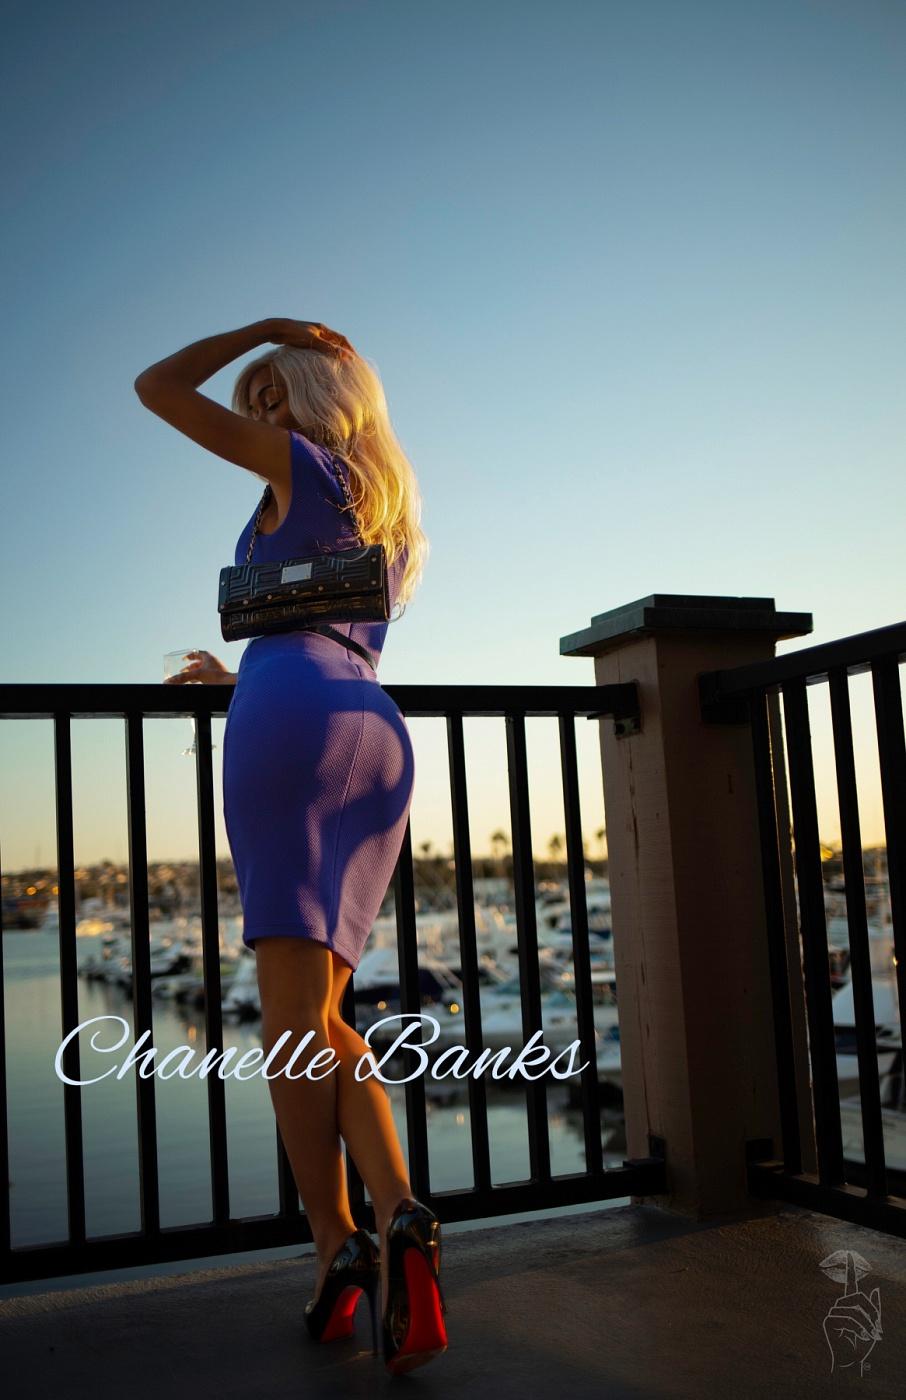 Chanelle Banks